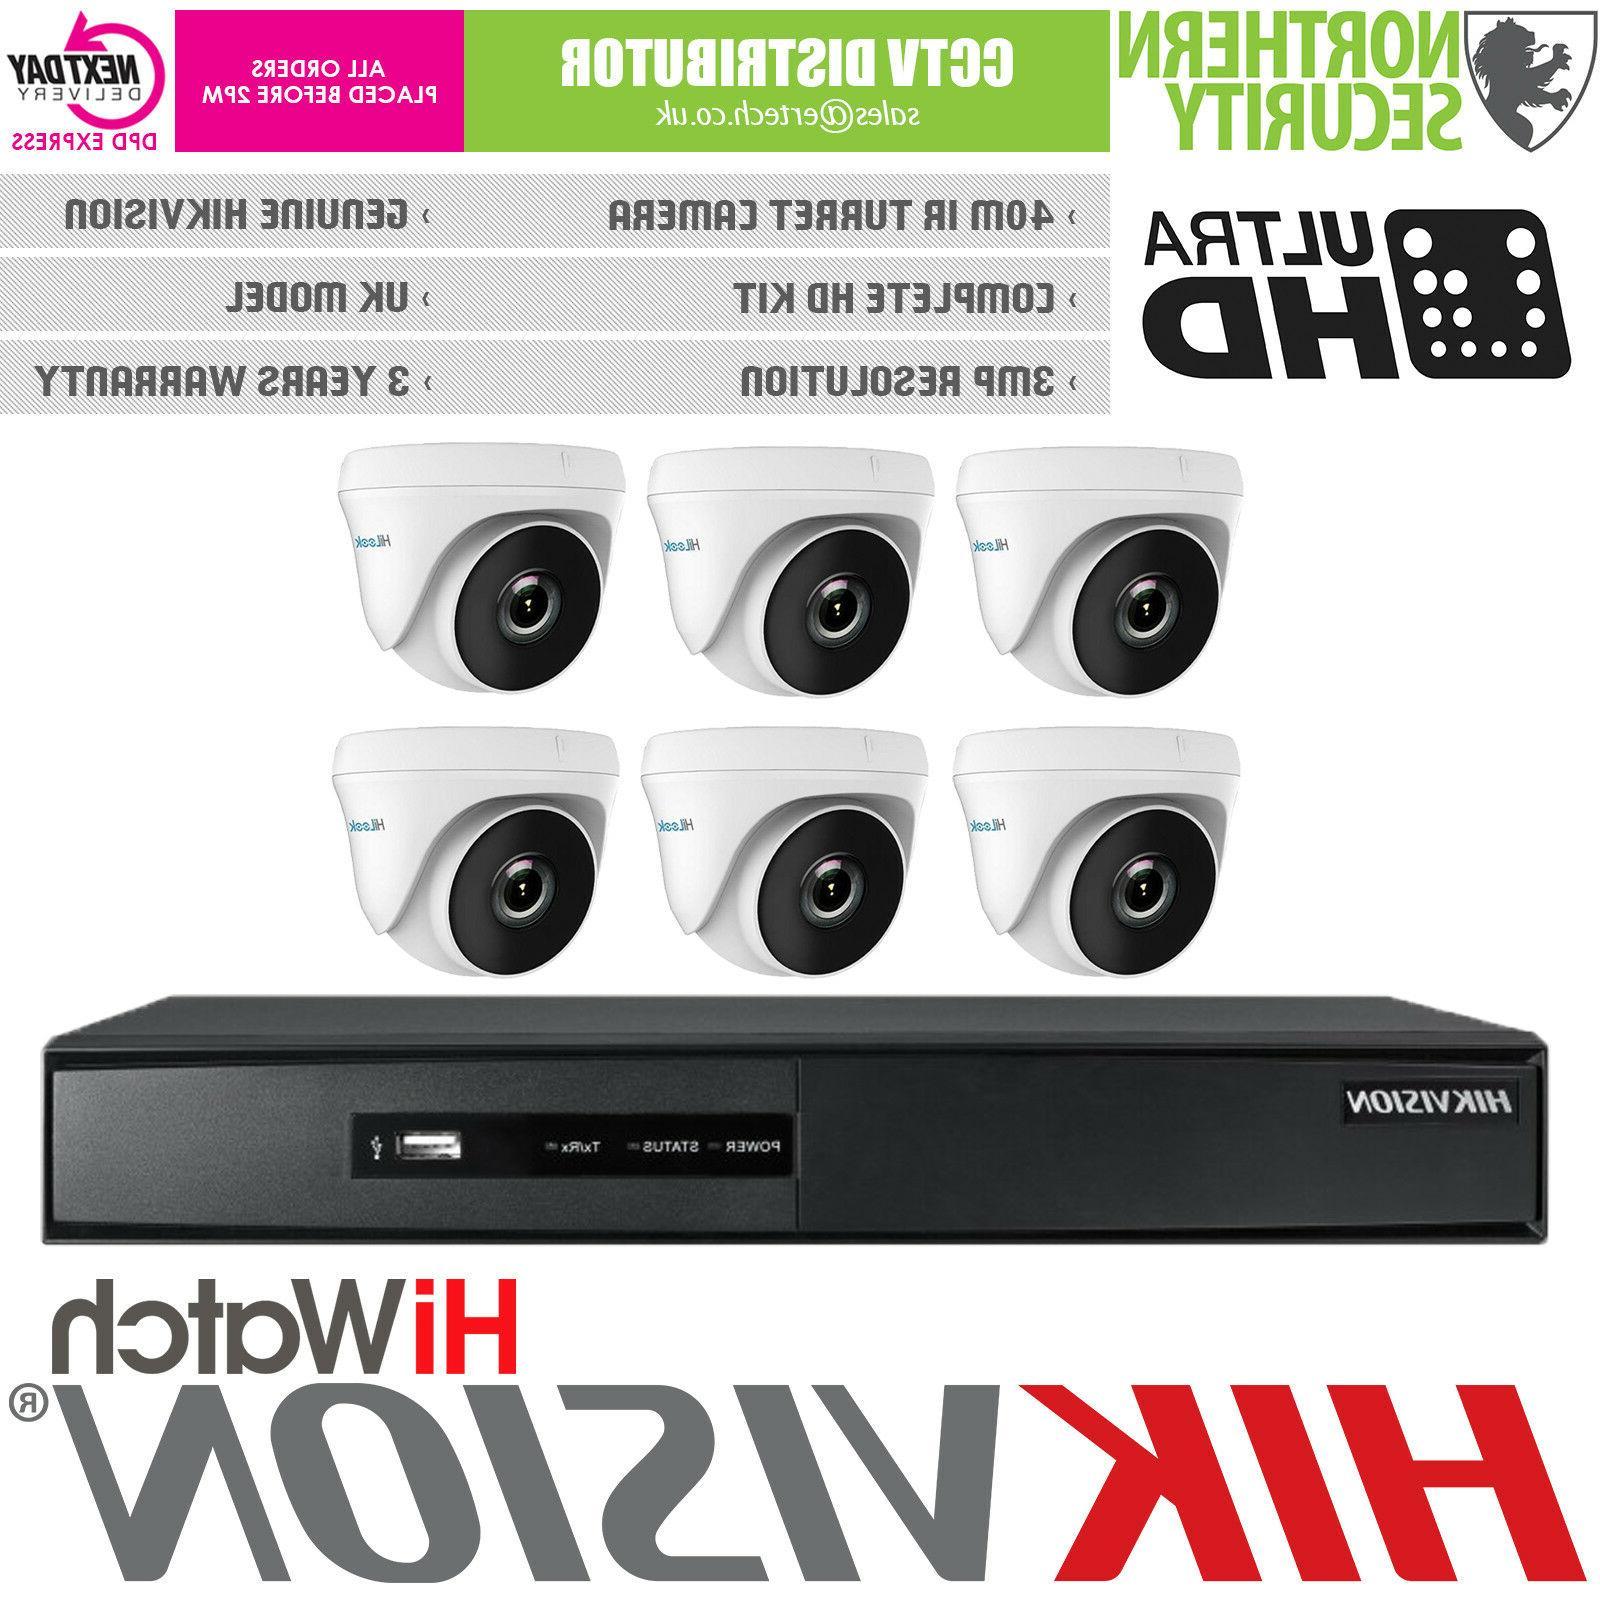 Hikvision 8 3MP 40M IR Alarm Turbo DVR Home Security Kit